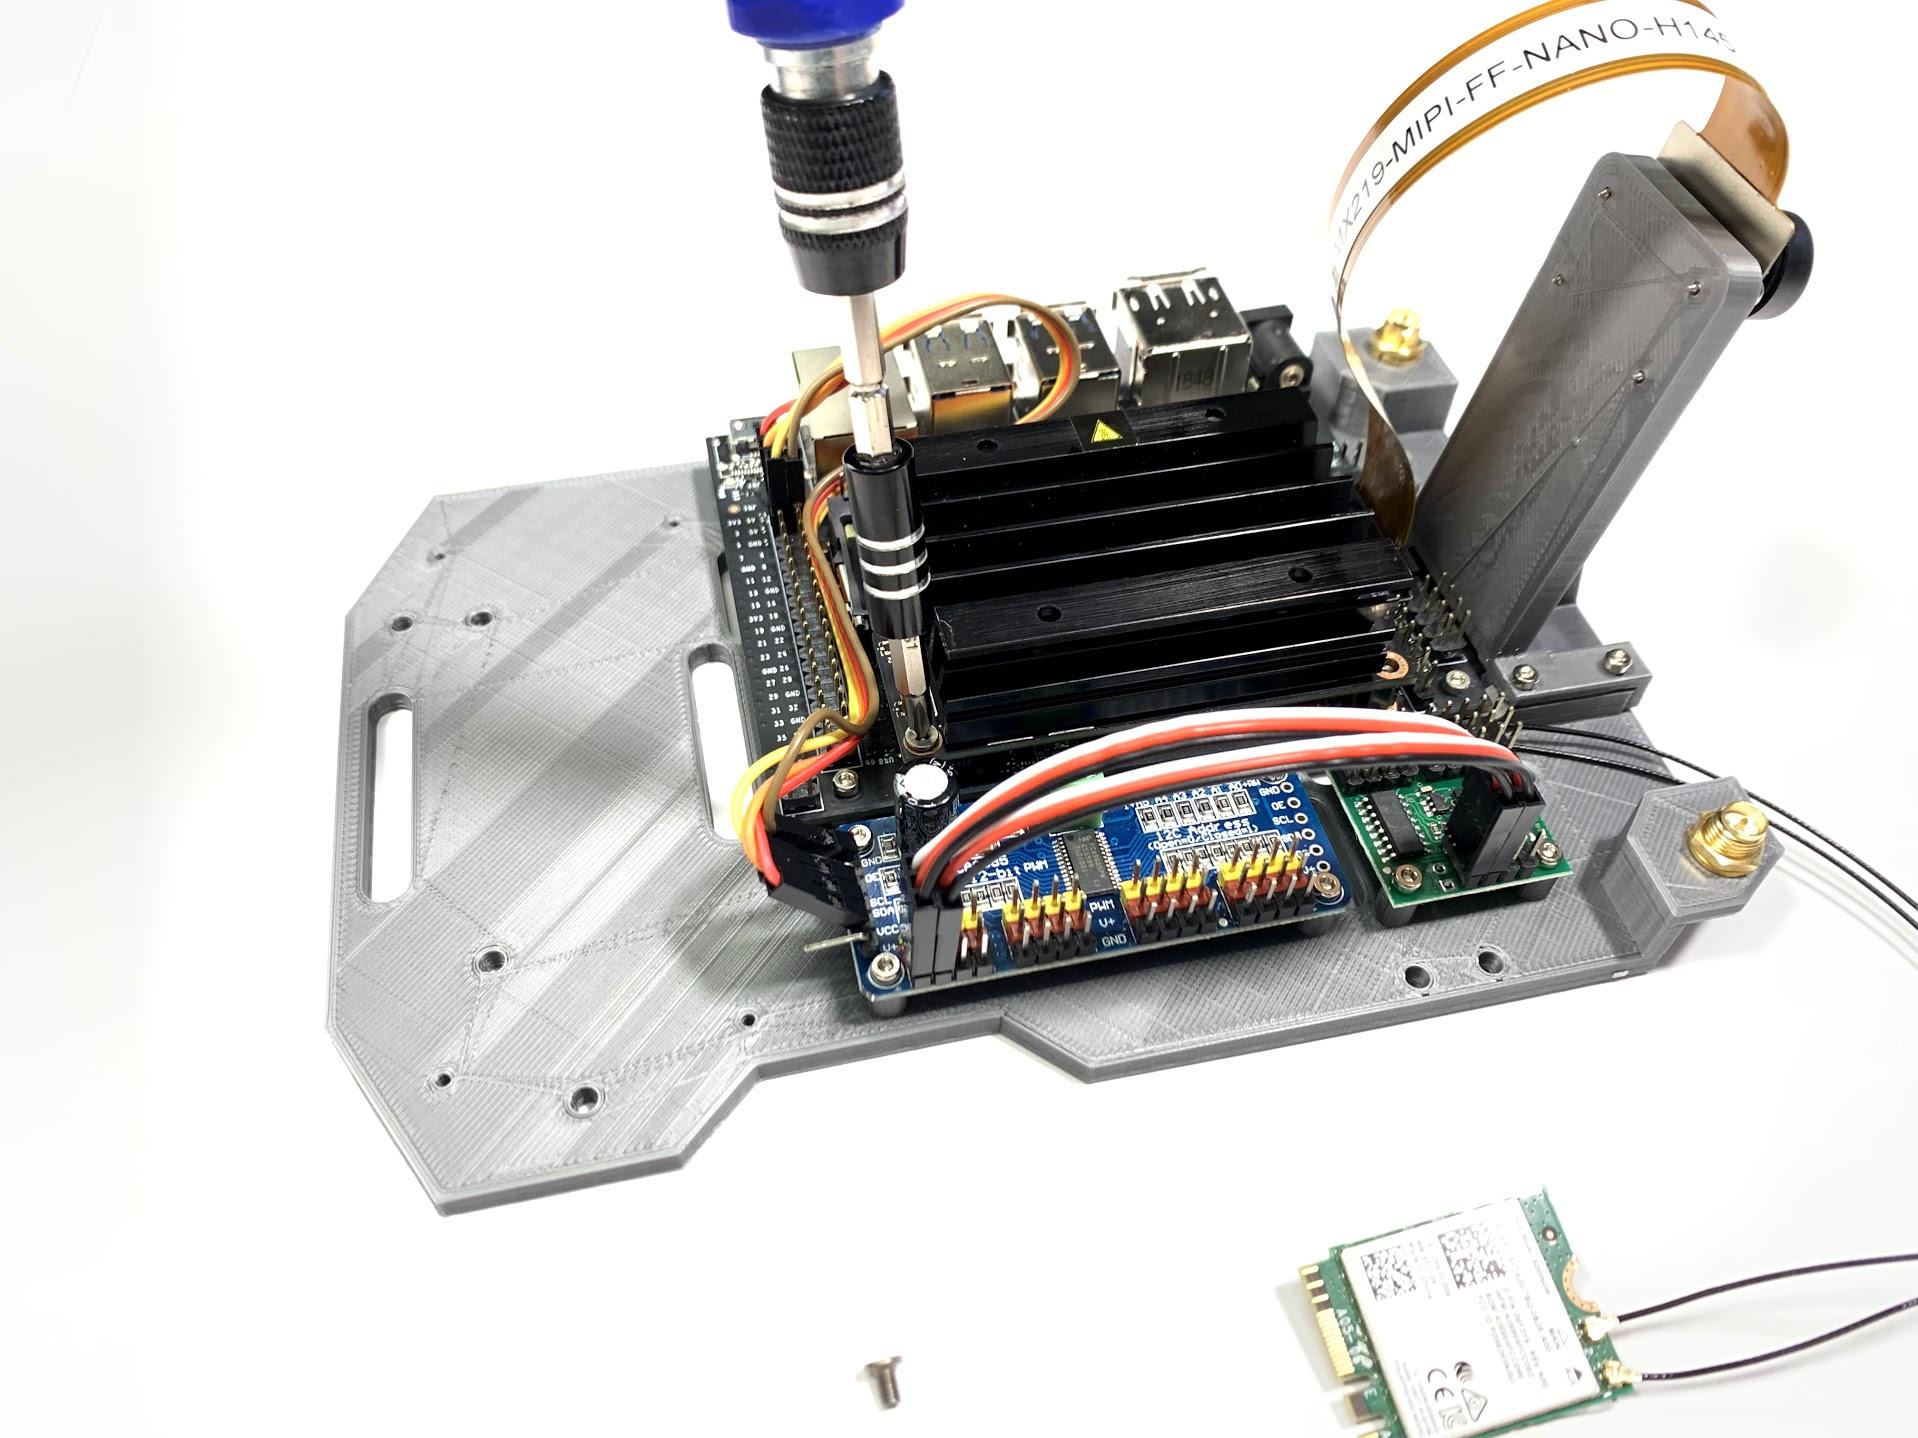 jetracer/hardware_setup md at master · NVIDIA-AI-IOT/jetracer · GitHub